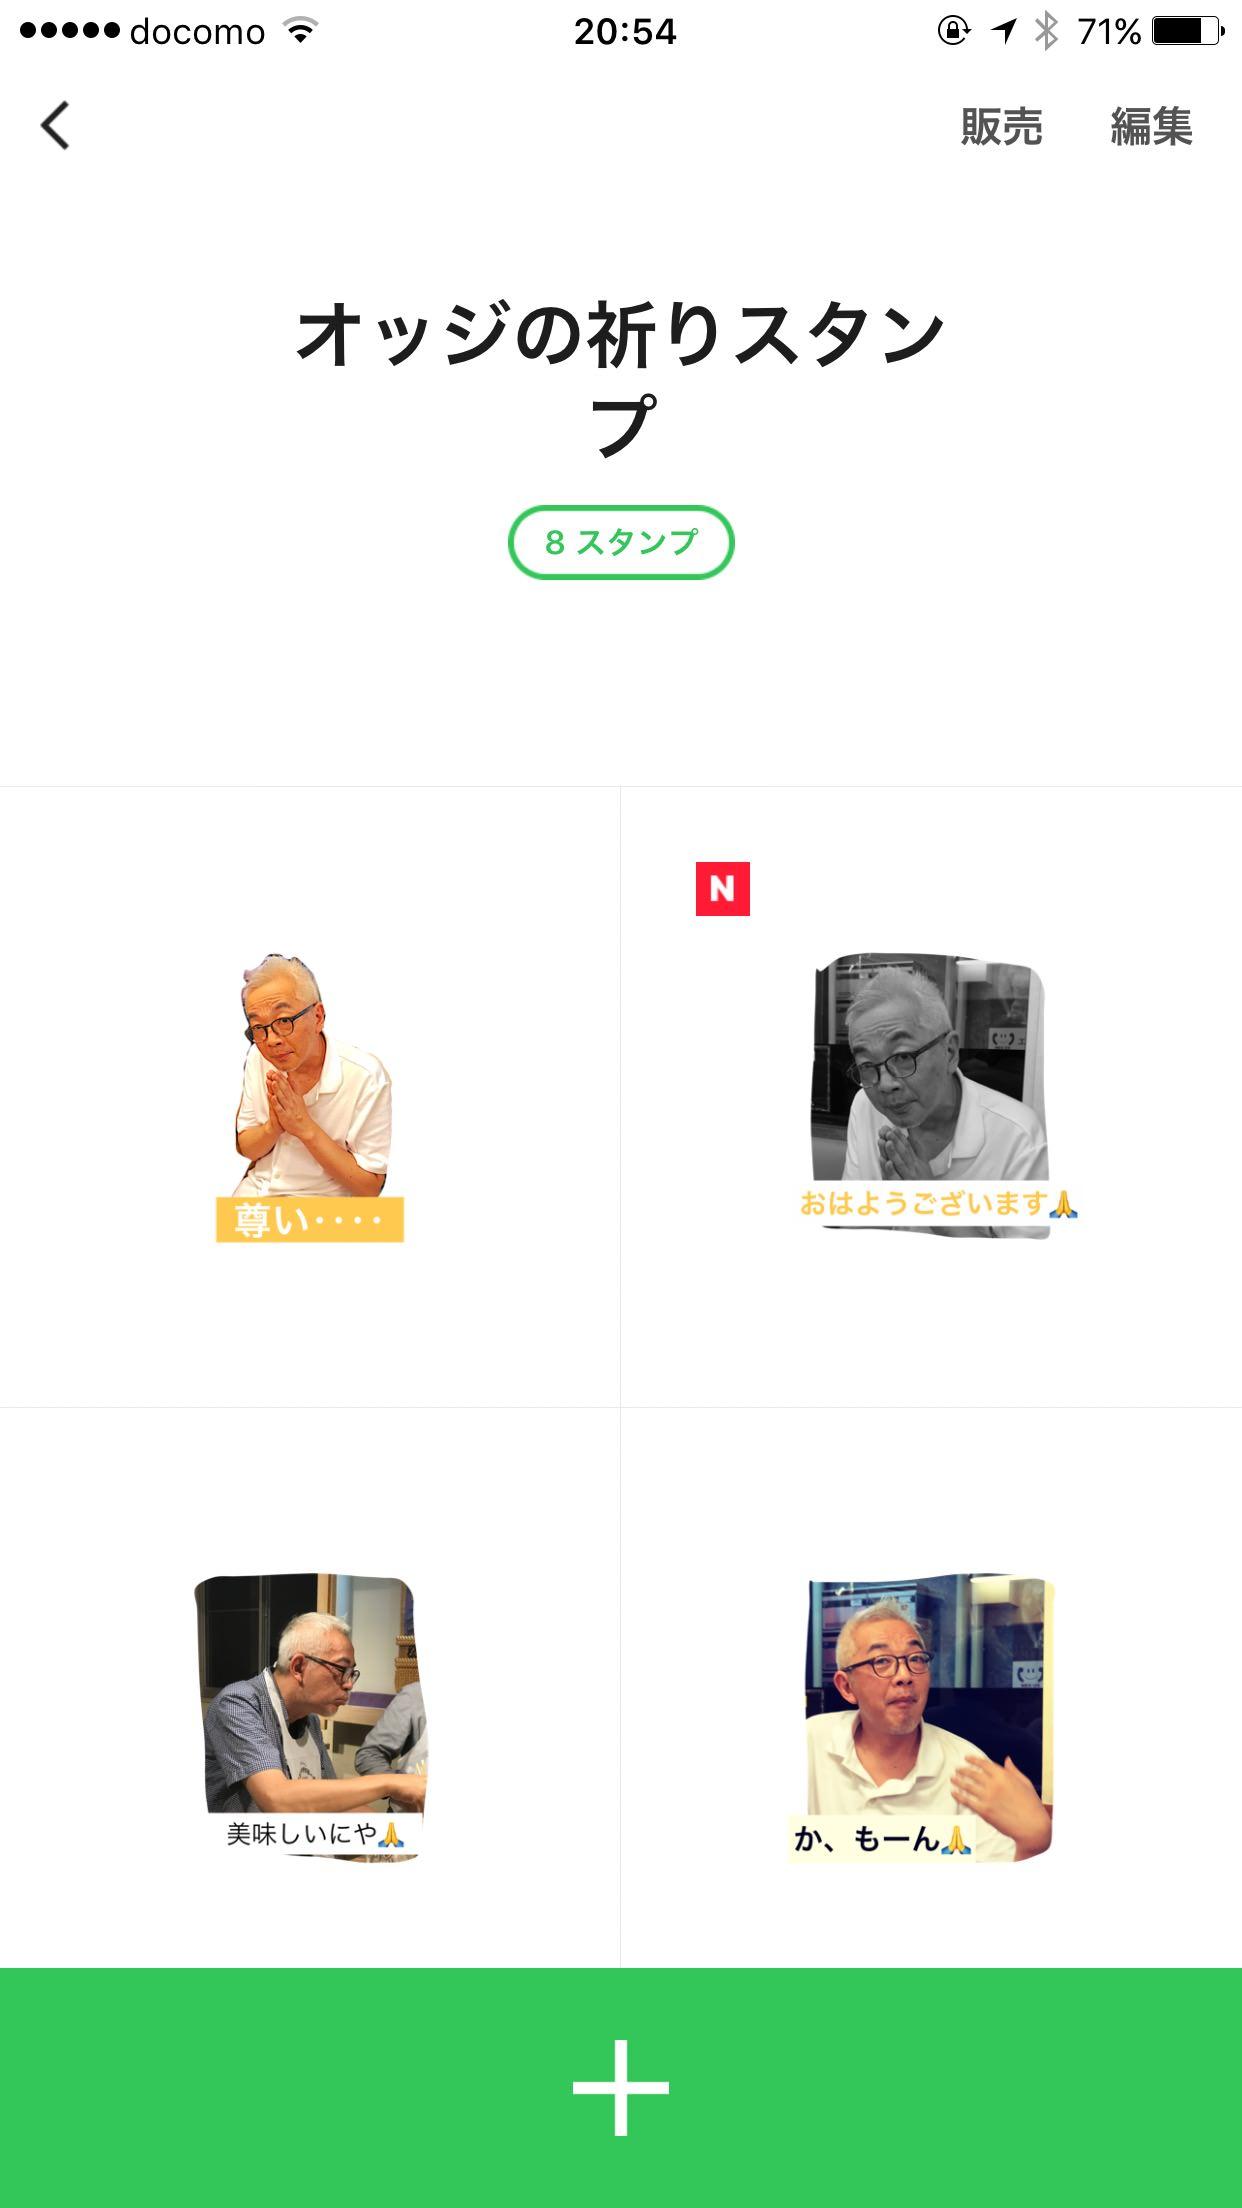 Line creators stamp 5335